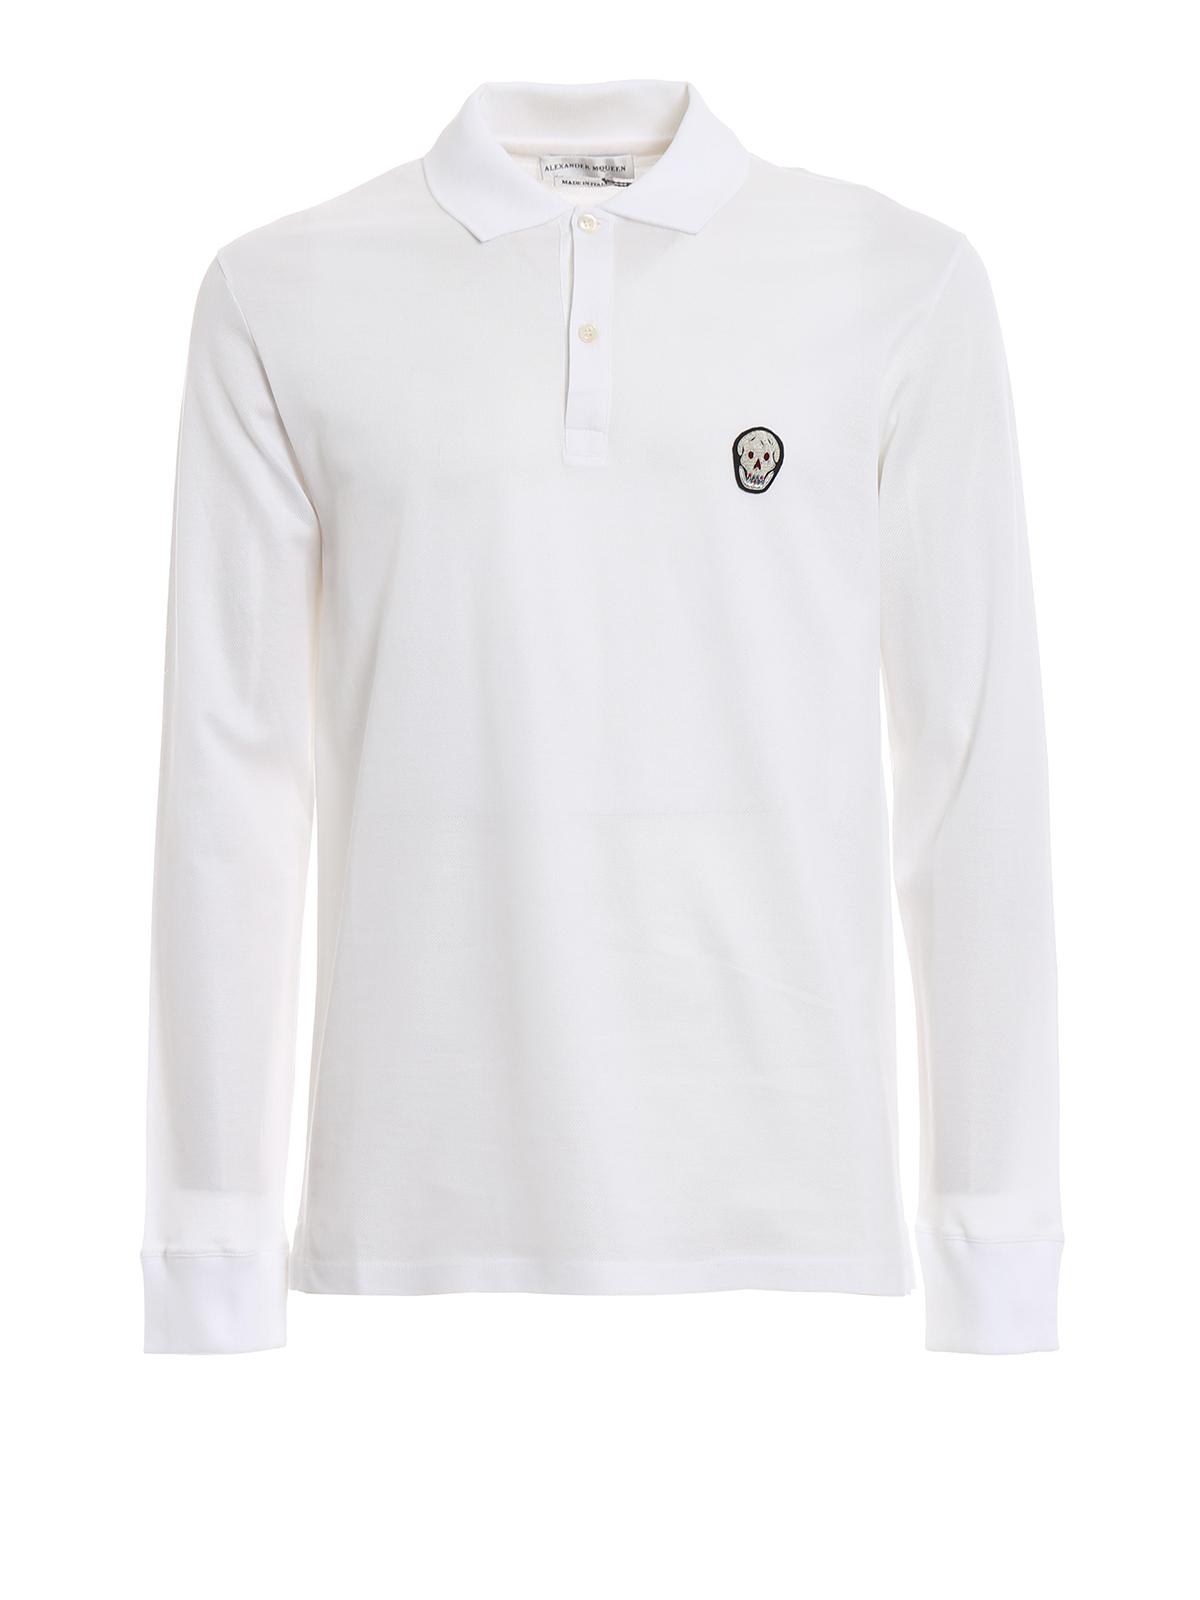 95d92a09c ALEXANDER MCQUEEN: polo shirts - Skull embroidery white long sleeve polo  shirt